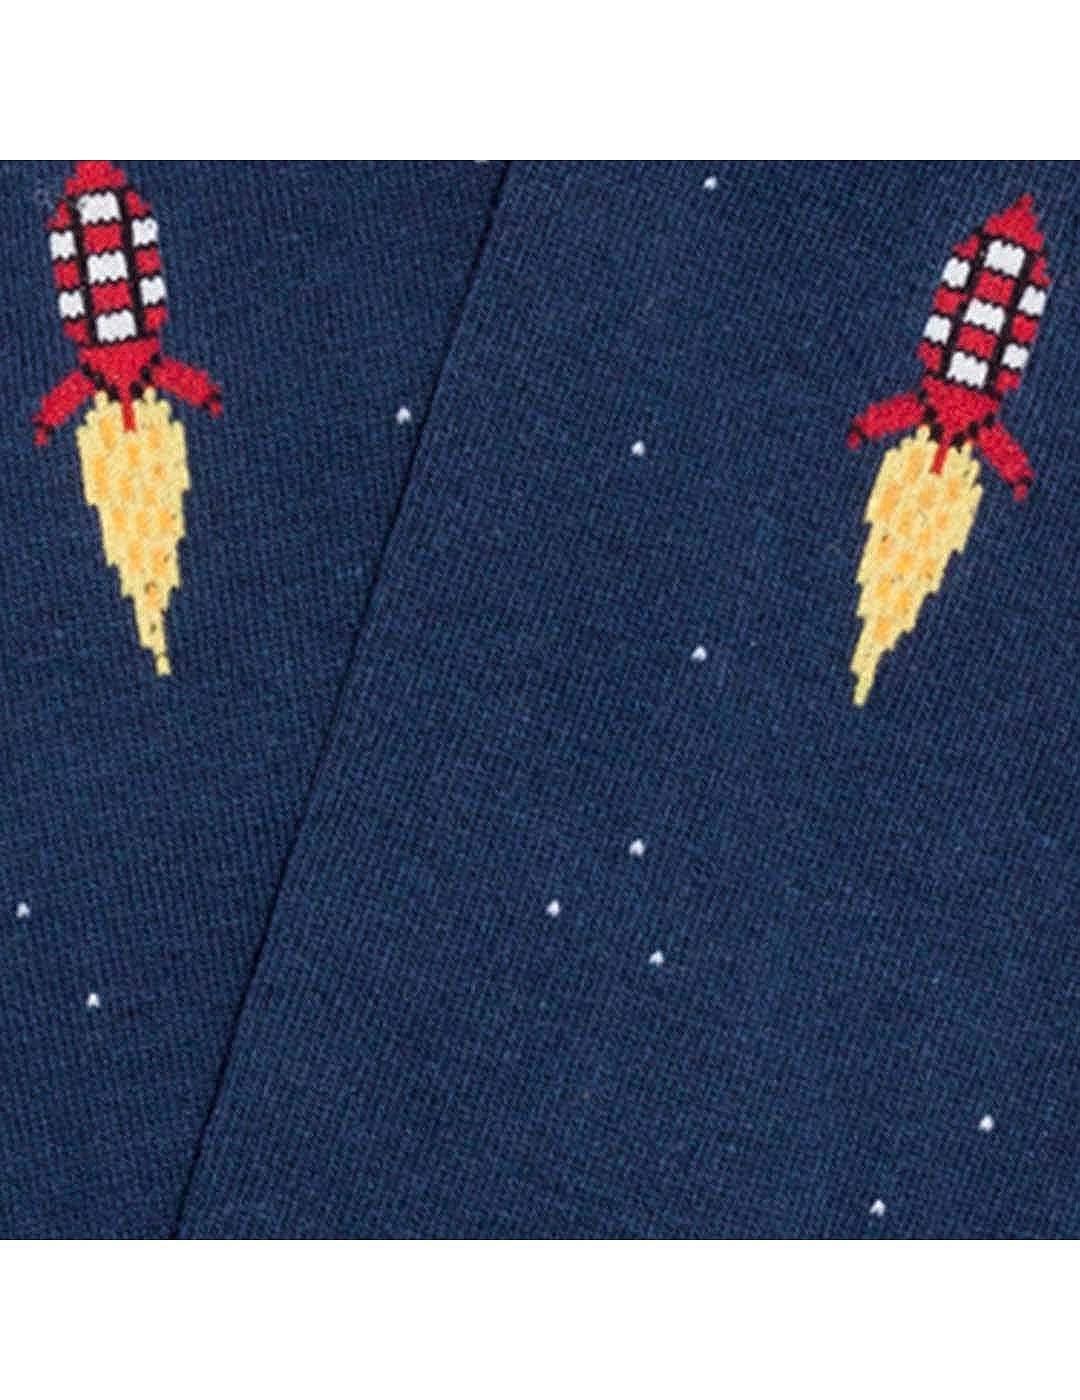 JIMMY LION Calcet/ín Space Rocket Azul